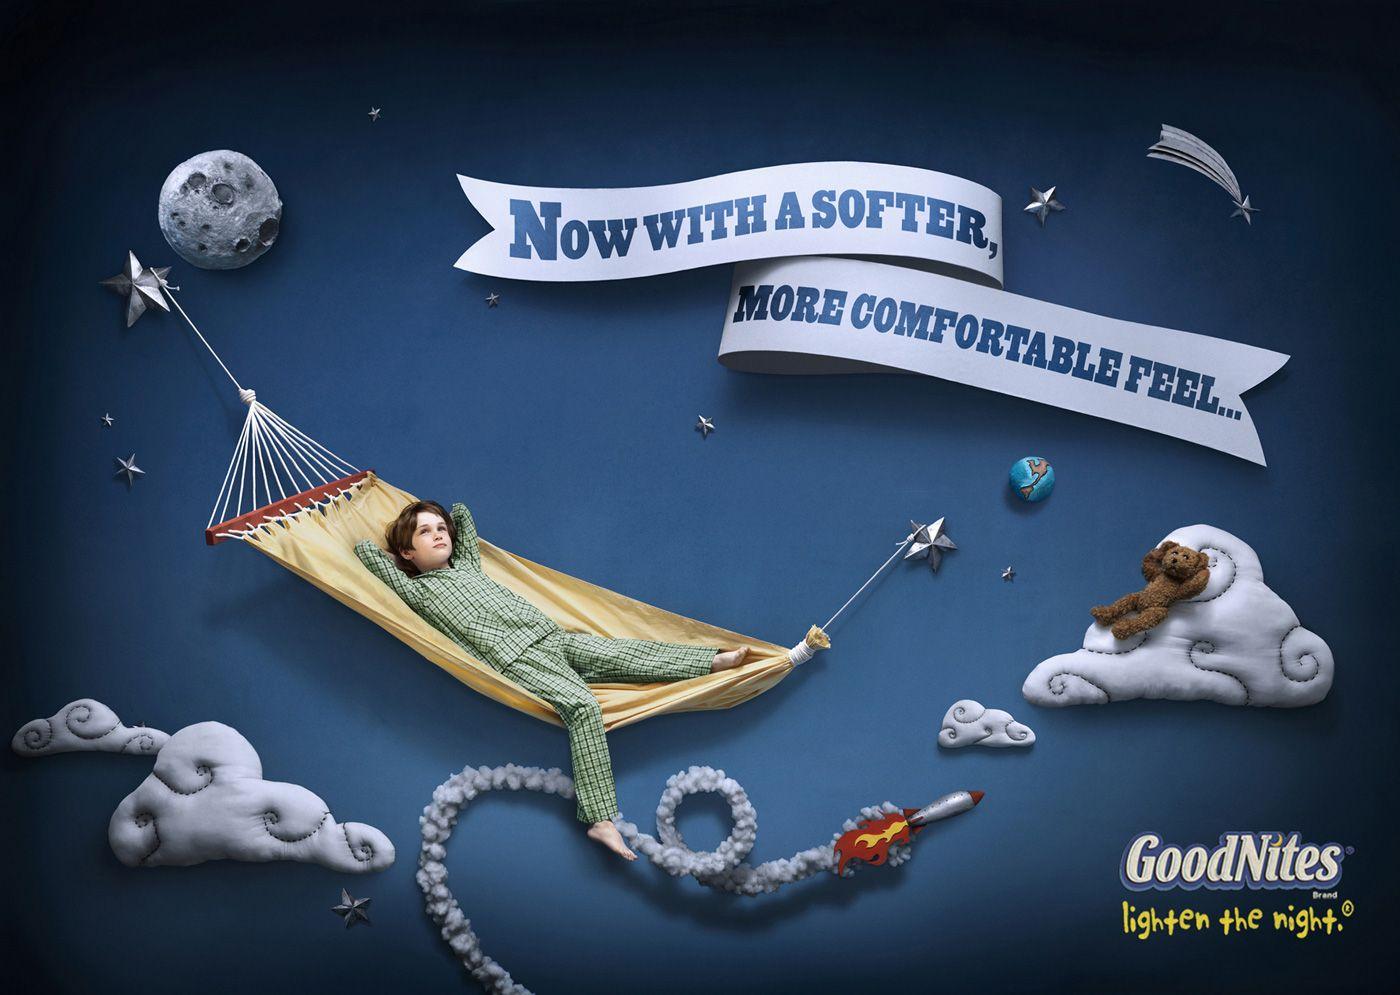 Goodnites underwear hammock publicidade pinterest